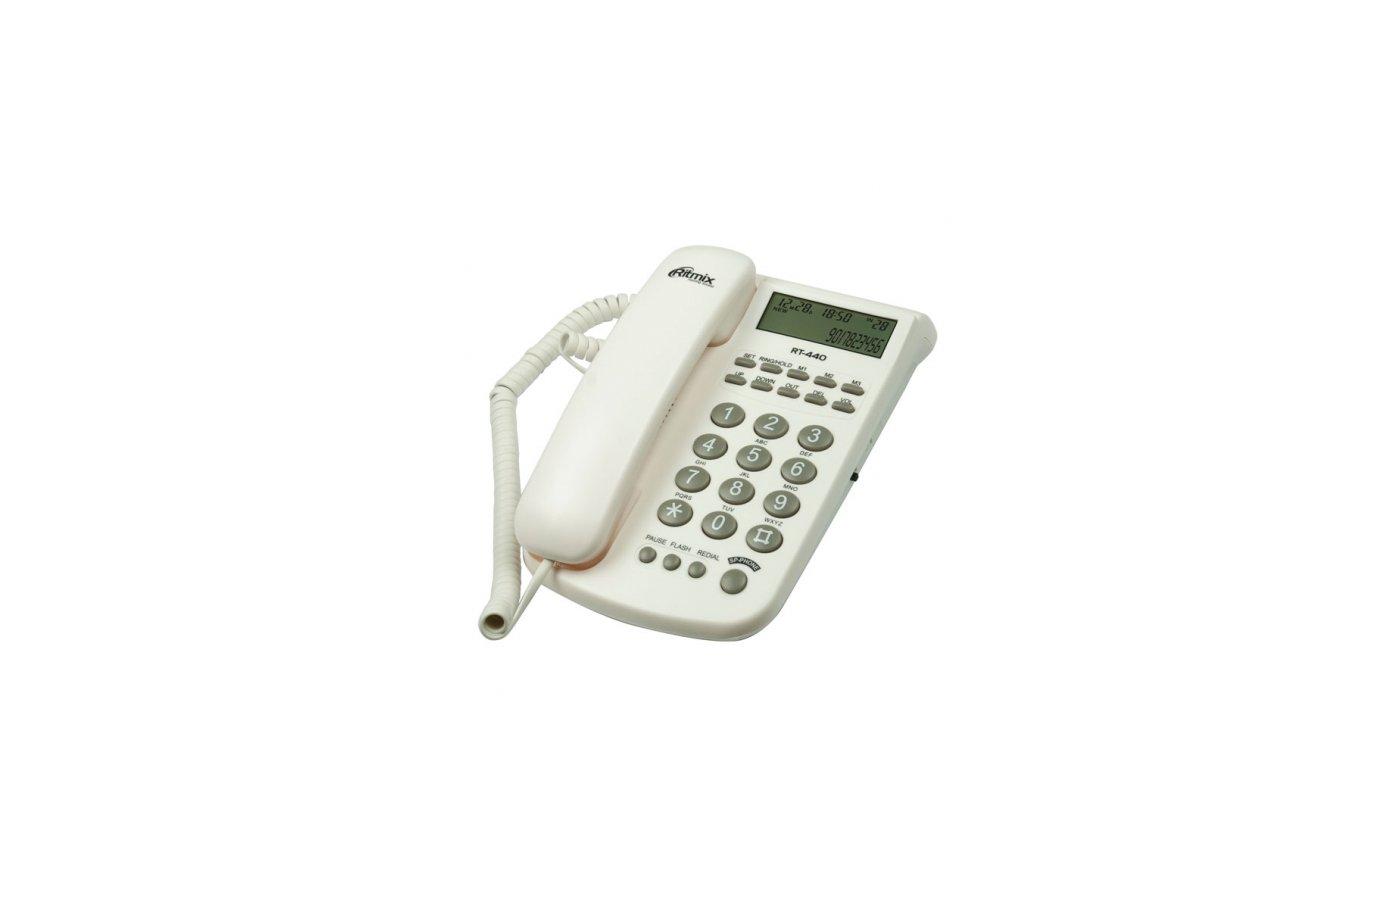 Проводной телефон Ritmix RT-440 white